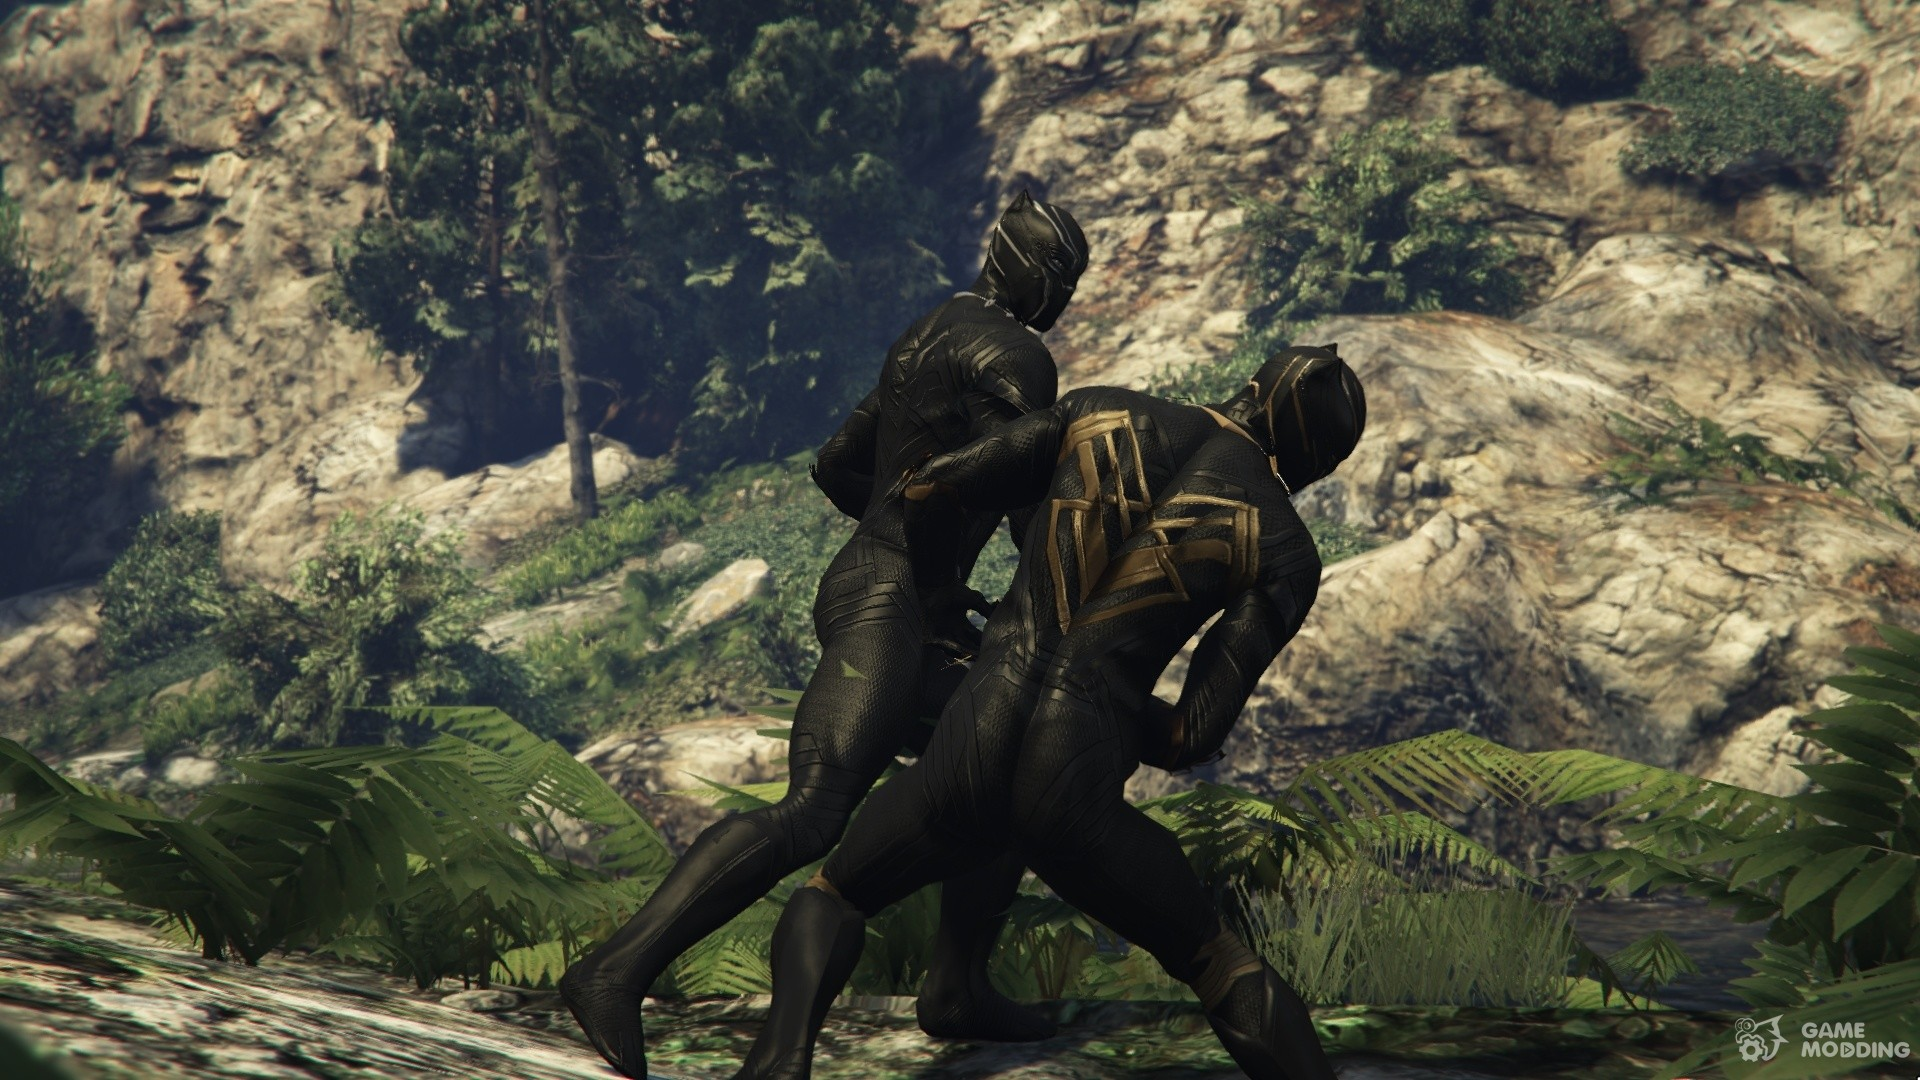 gta v black panther mod